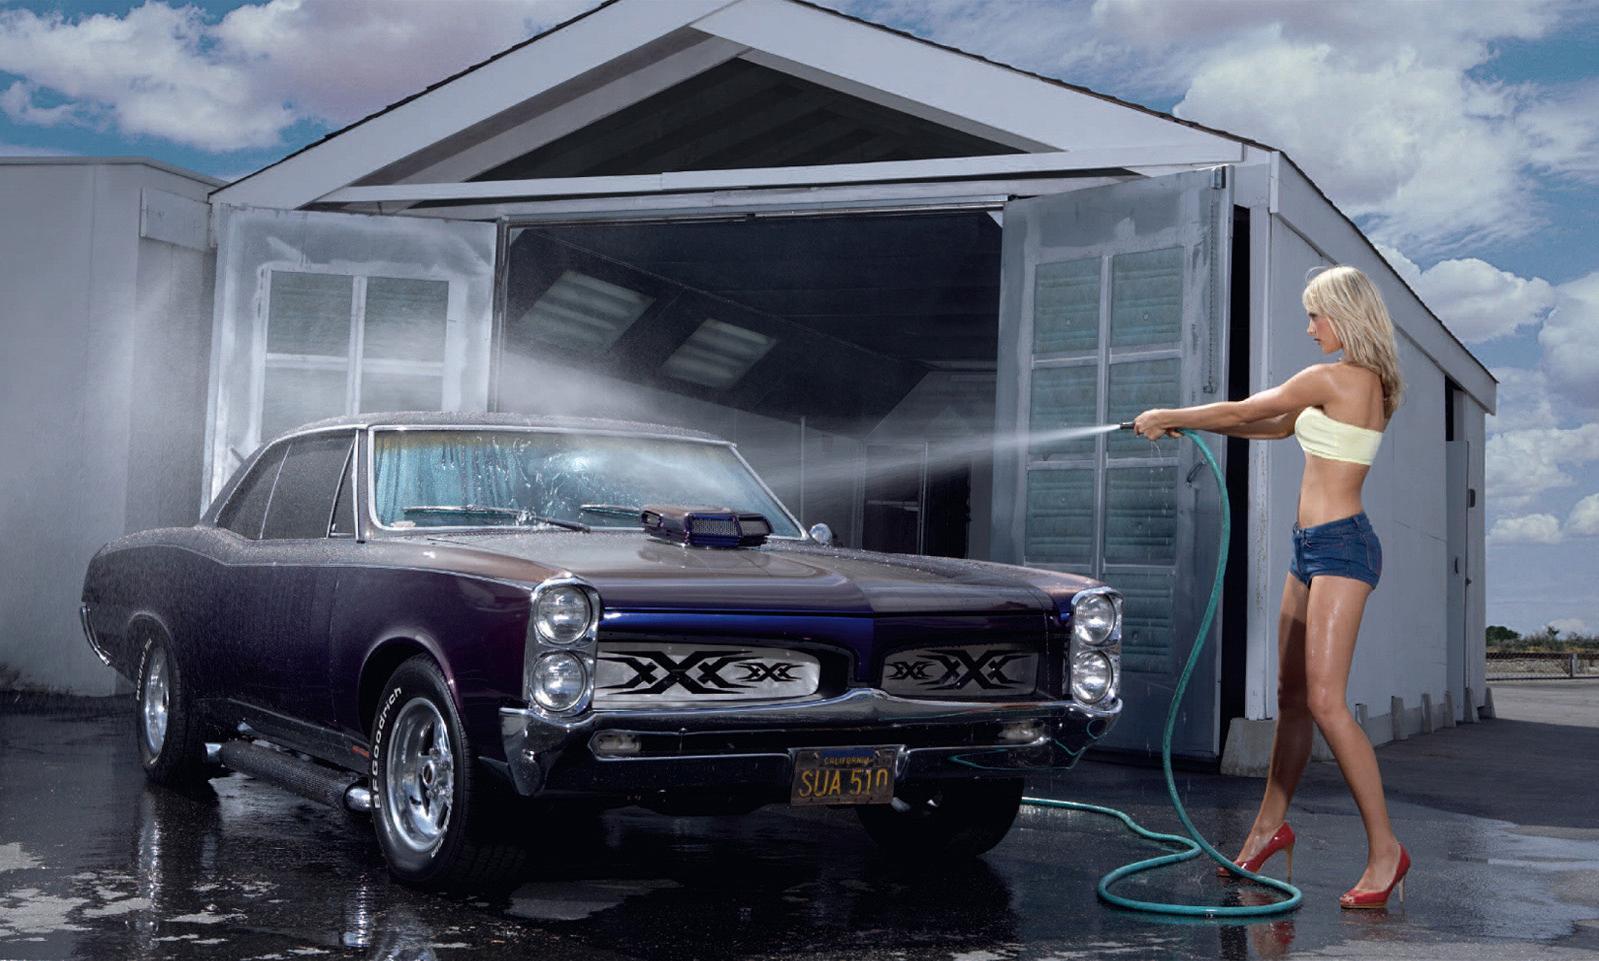 Laver sa voiture moindre co t informateque - Nettoyer sa voiture au vinaigre blanc ...